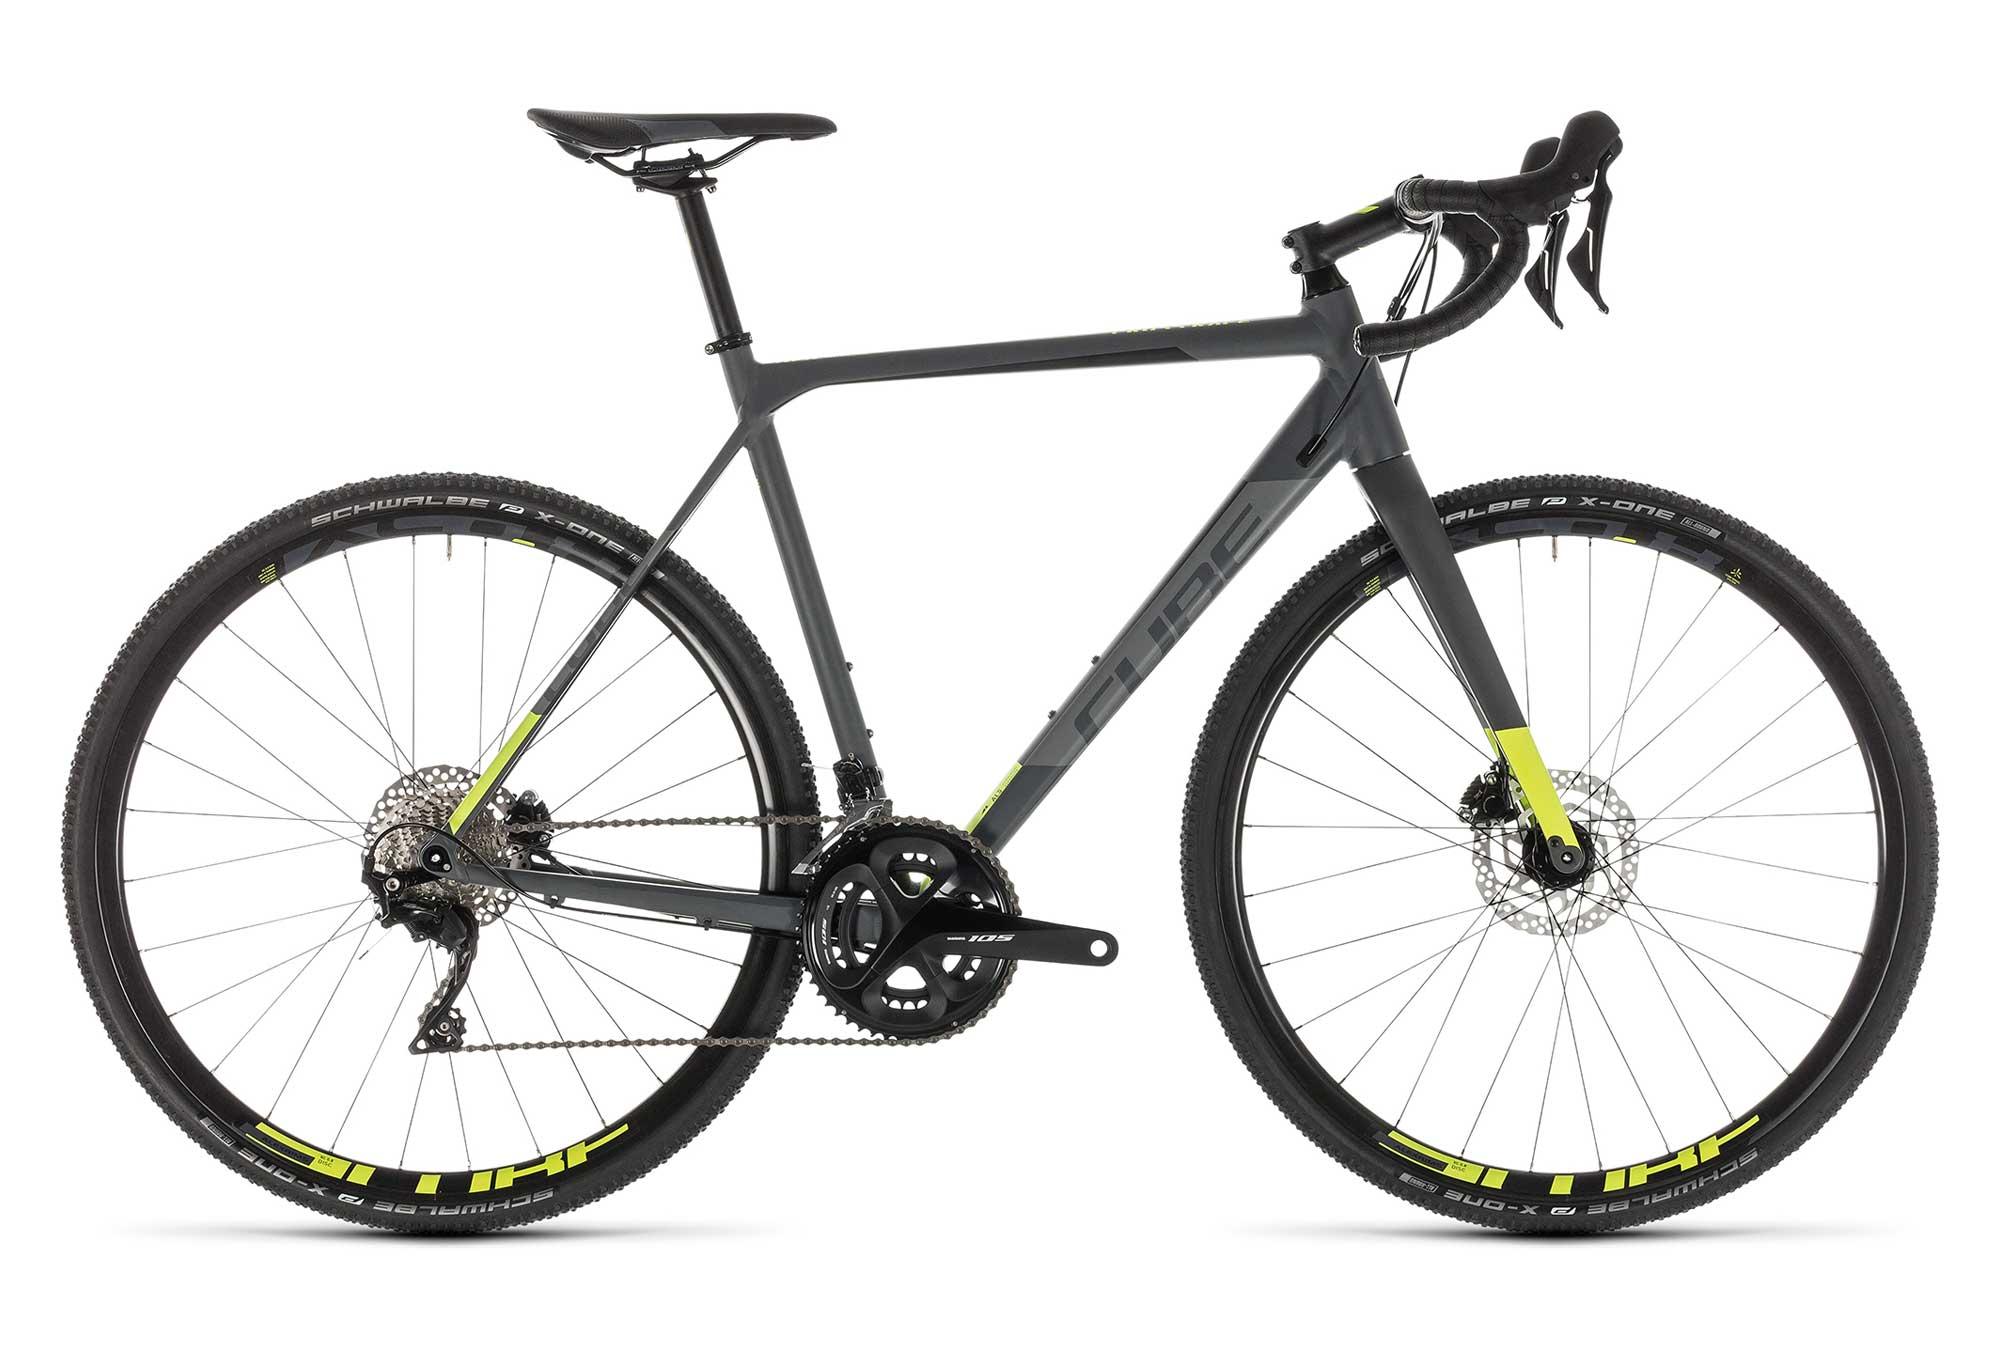 086060485f0 Cube Cross Race Pro Cyclocross Bike Shimano 105 11S 2019 Grey Neon Yellow |  Alltricks.com